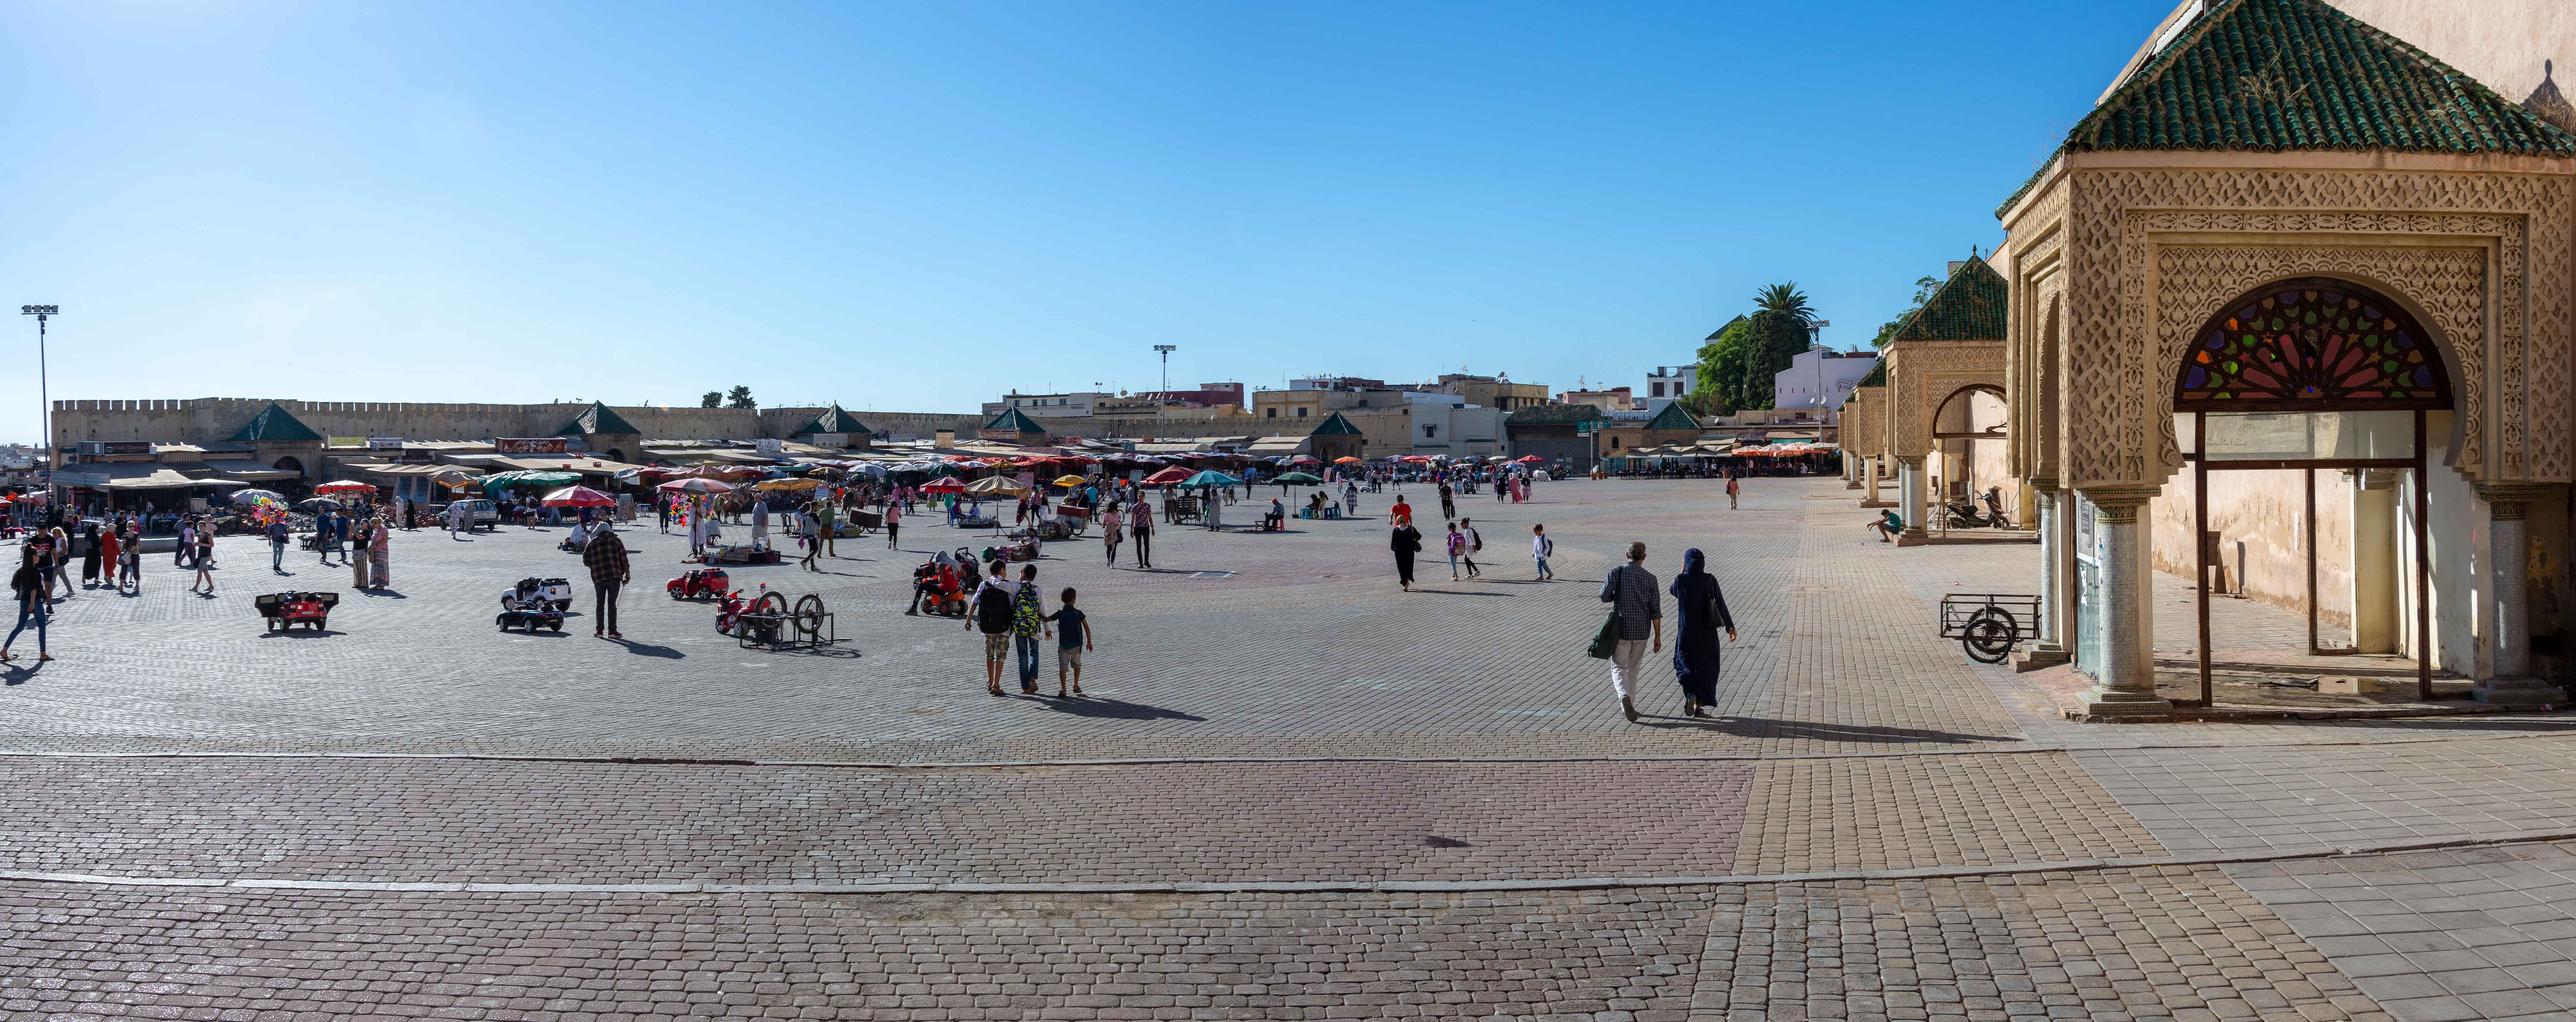 20181002_Marokko_051